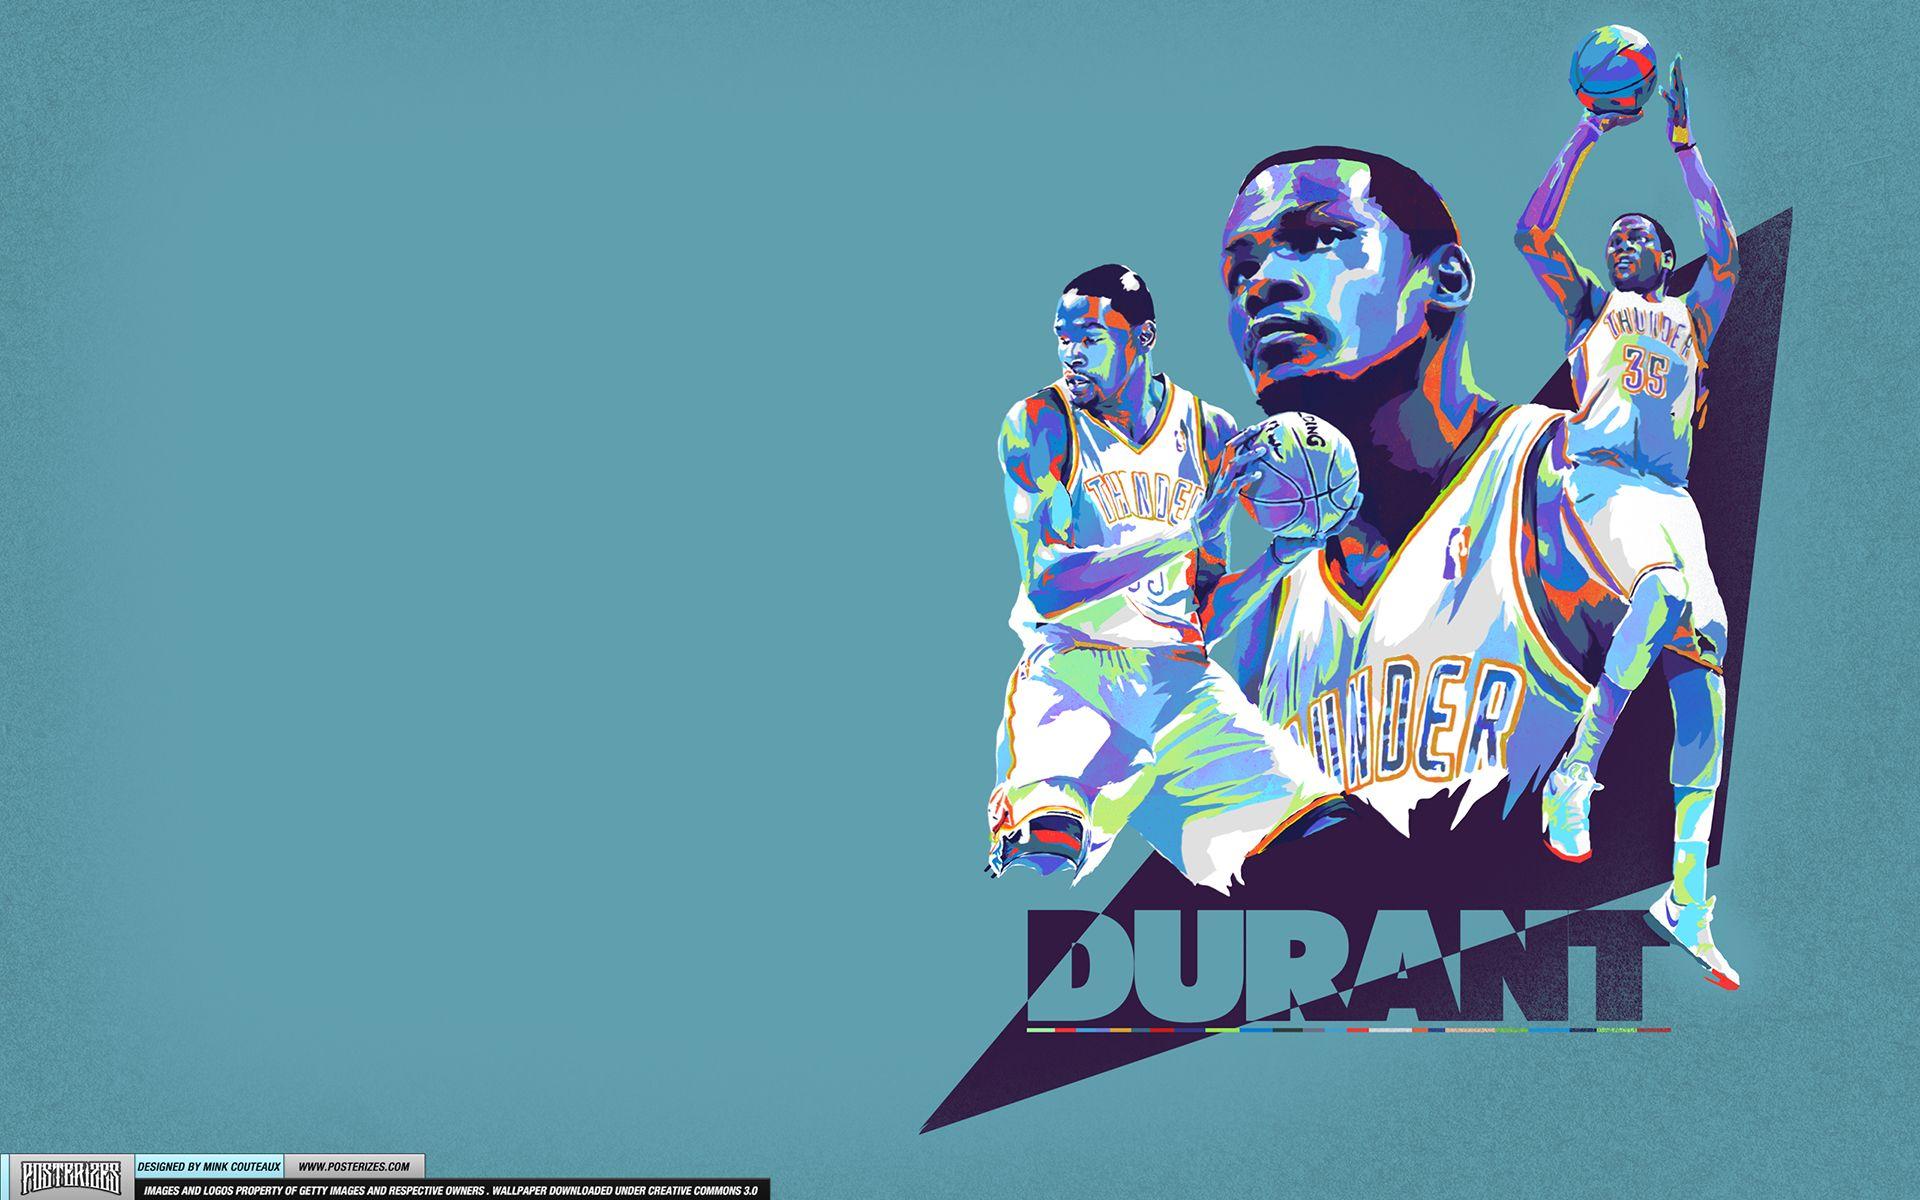 Kevin Durant Vs Lebron James wallpaper - 909330